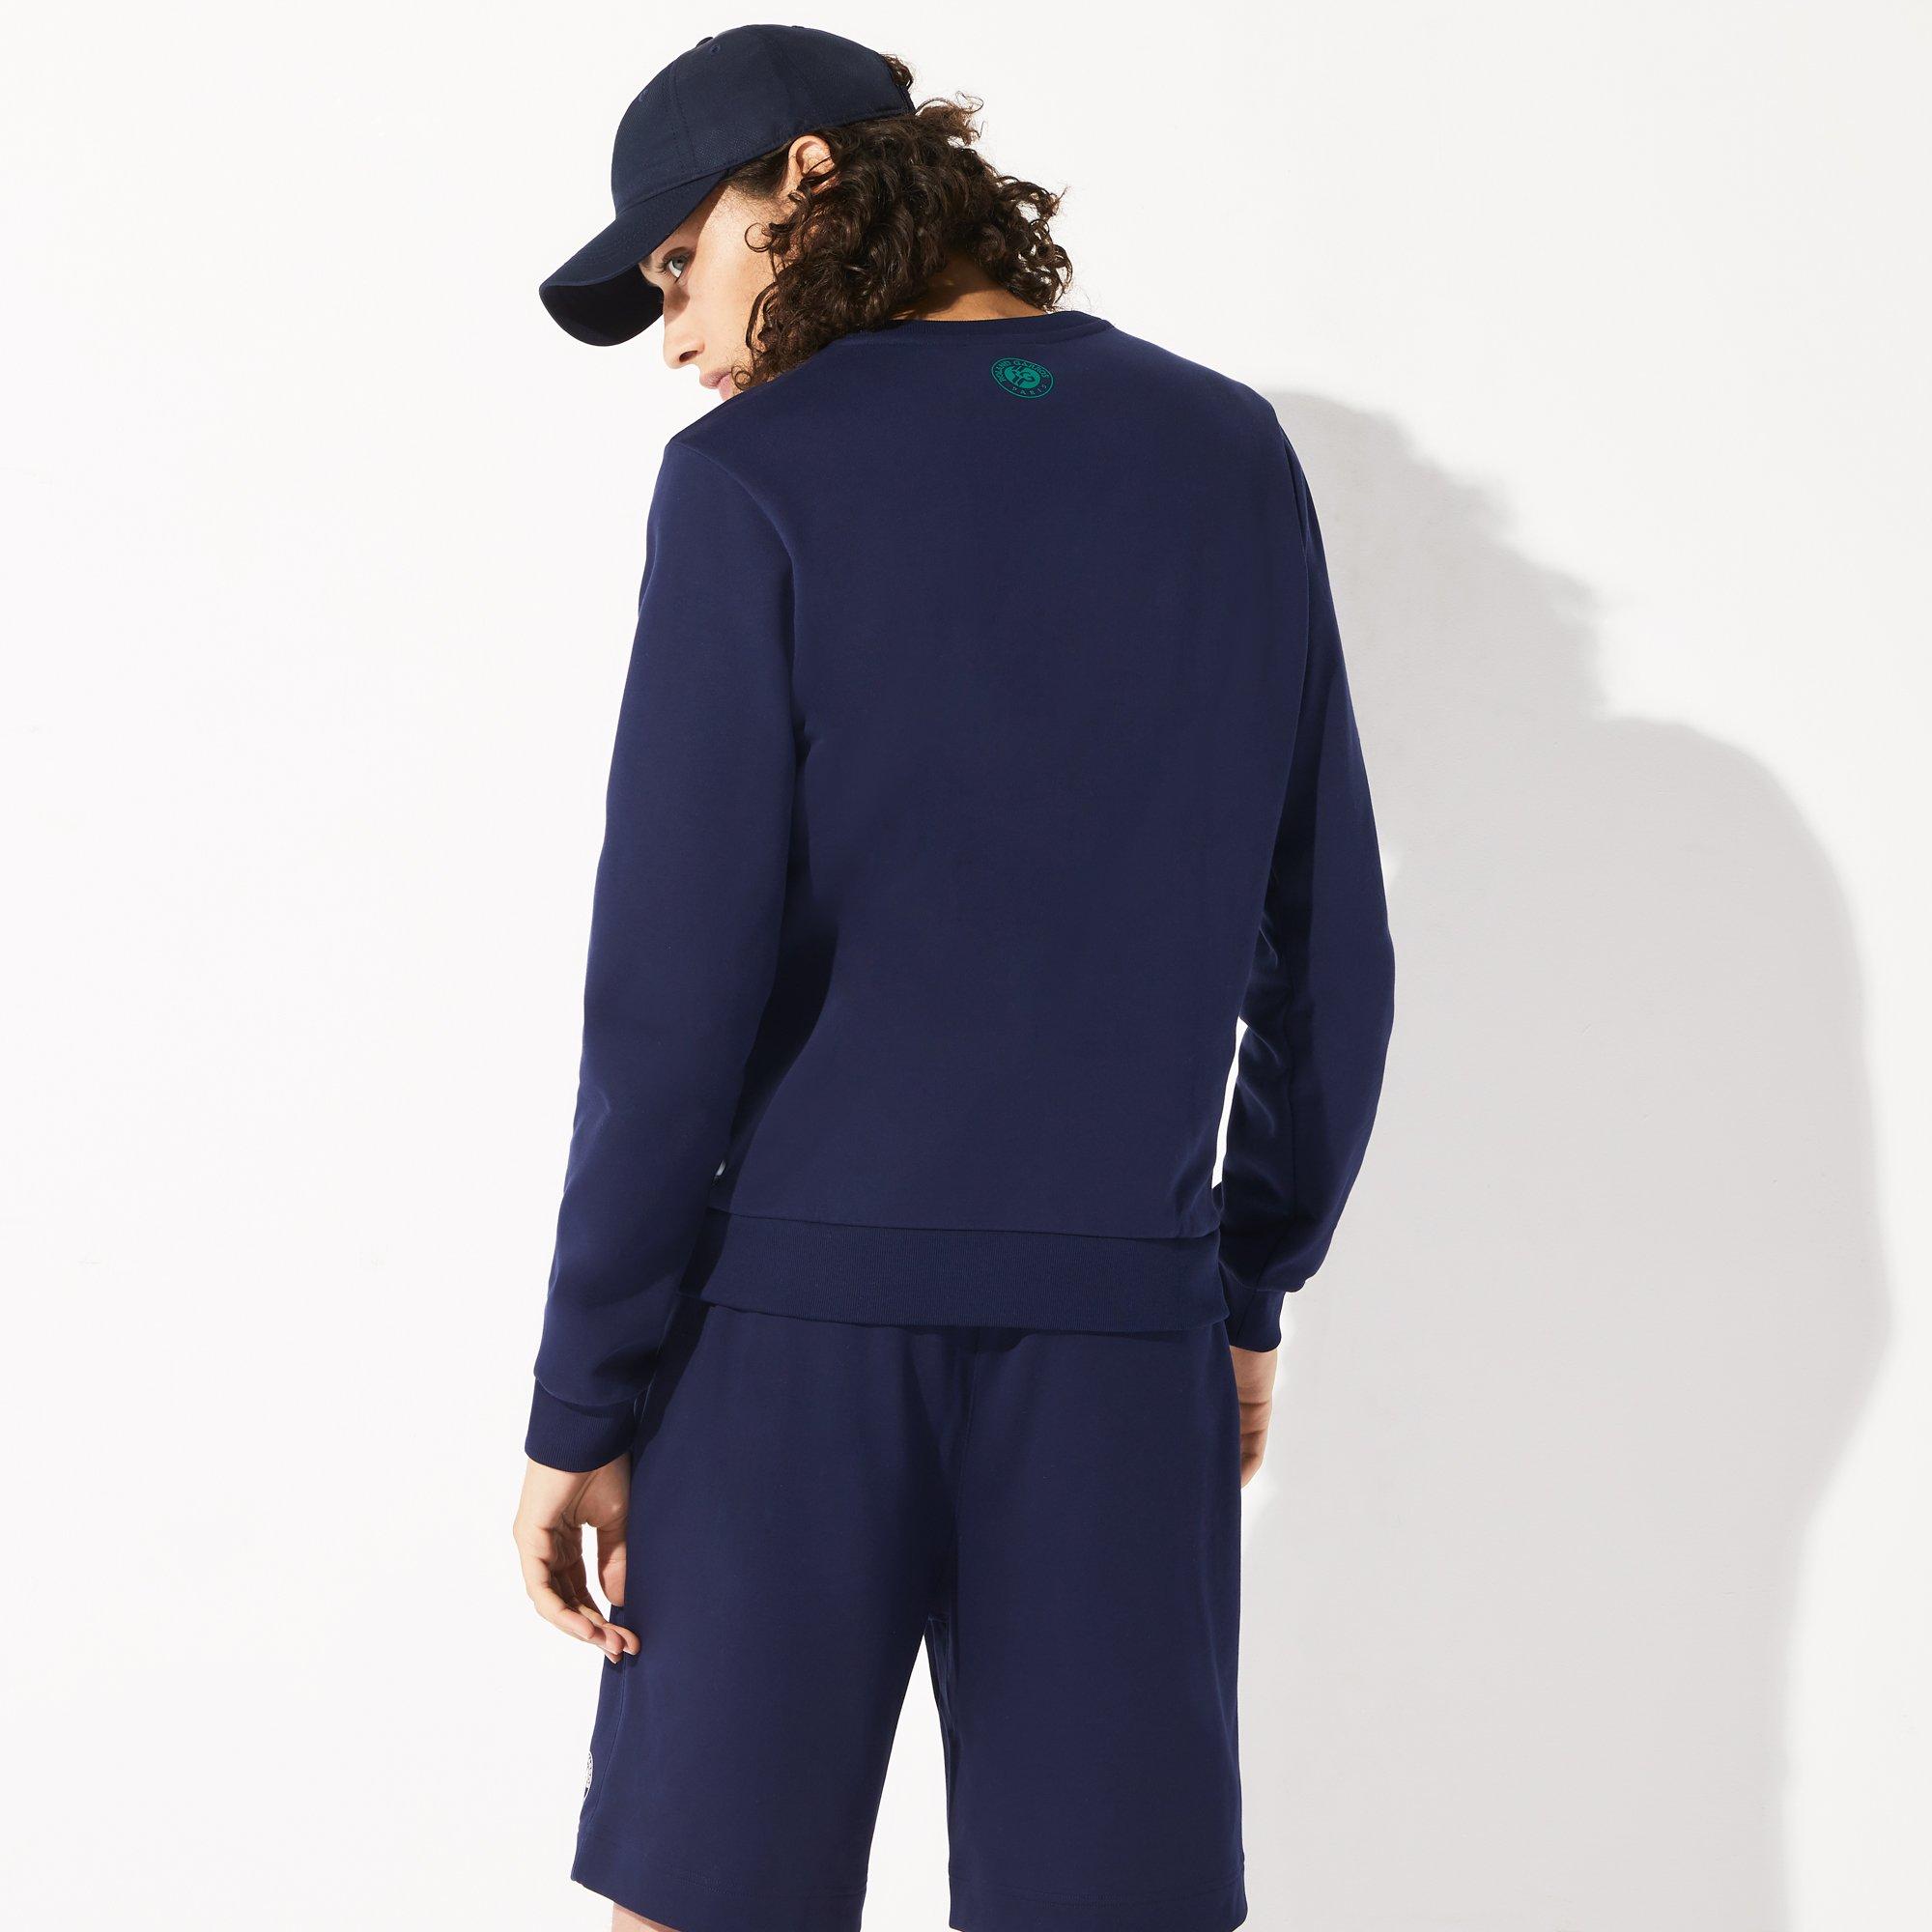 Talla 30/% poli/éster Sudadera con Capucha Modelo Nael Batida para Hombre 70/% algod/ón Roland Garros